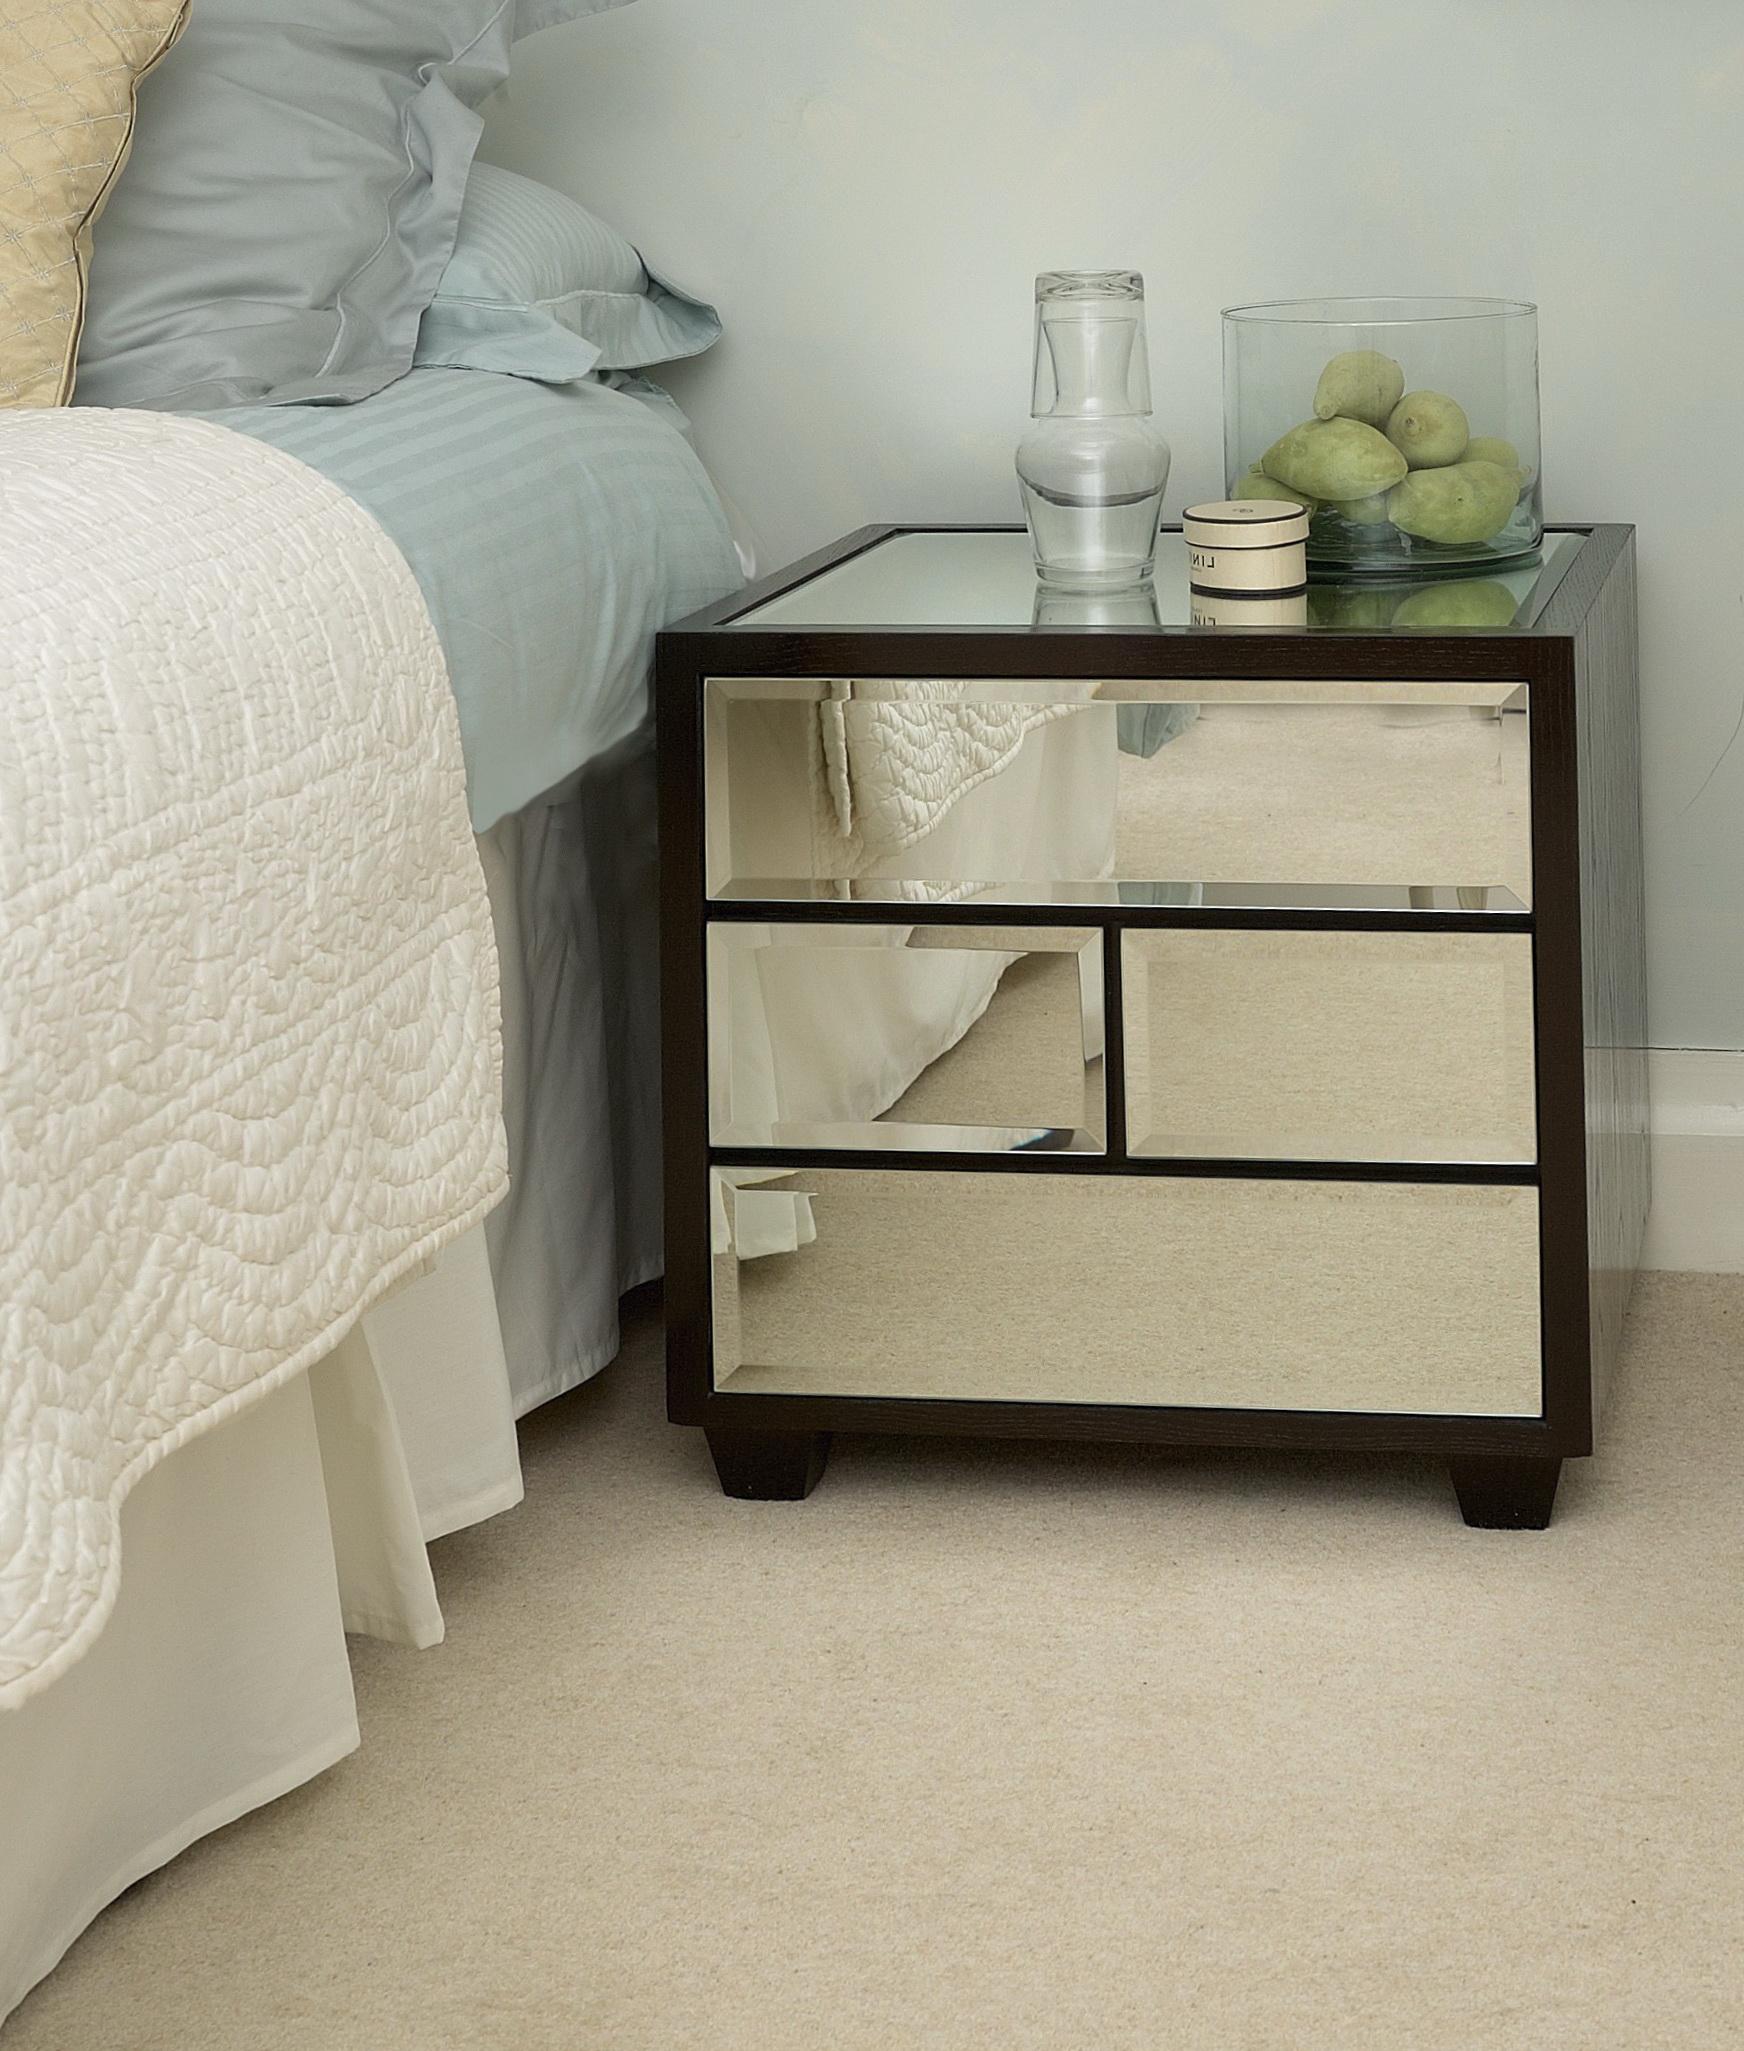 Mirrored Furniture Cheap Ebay Home Design Ideas